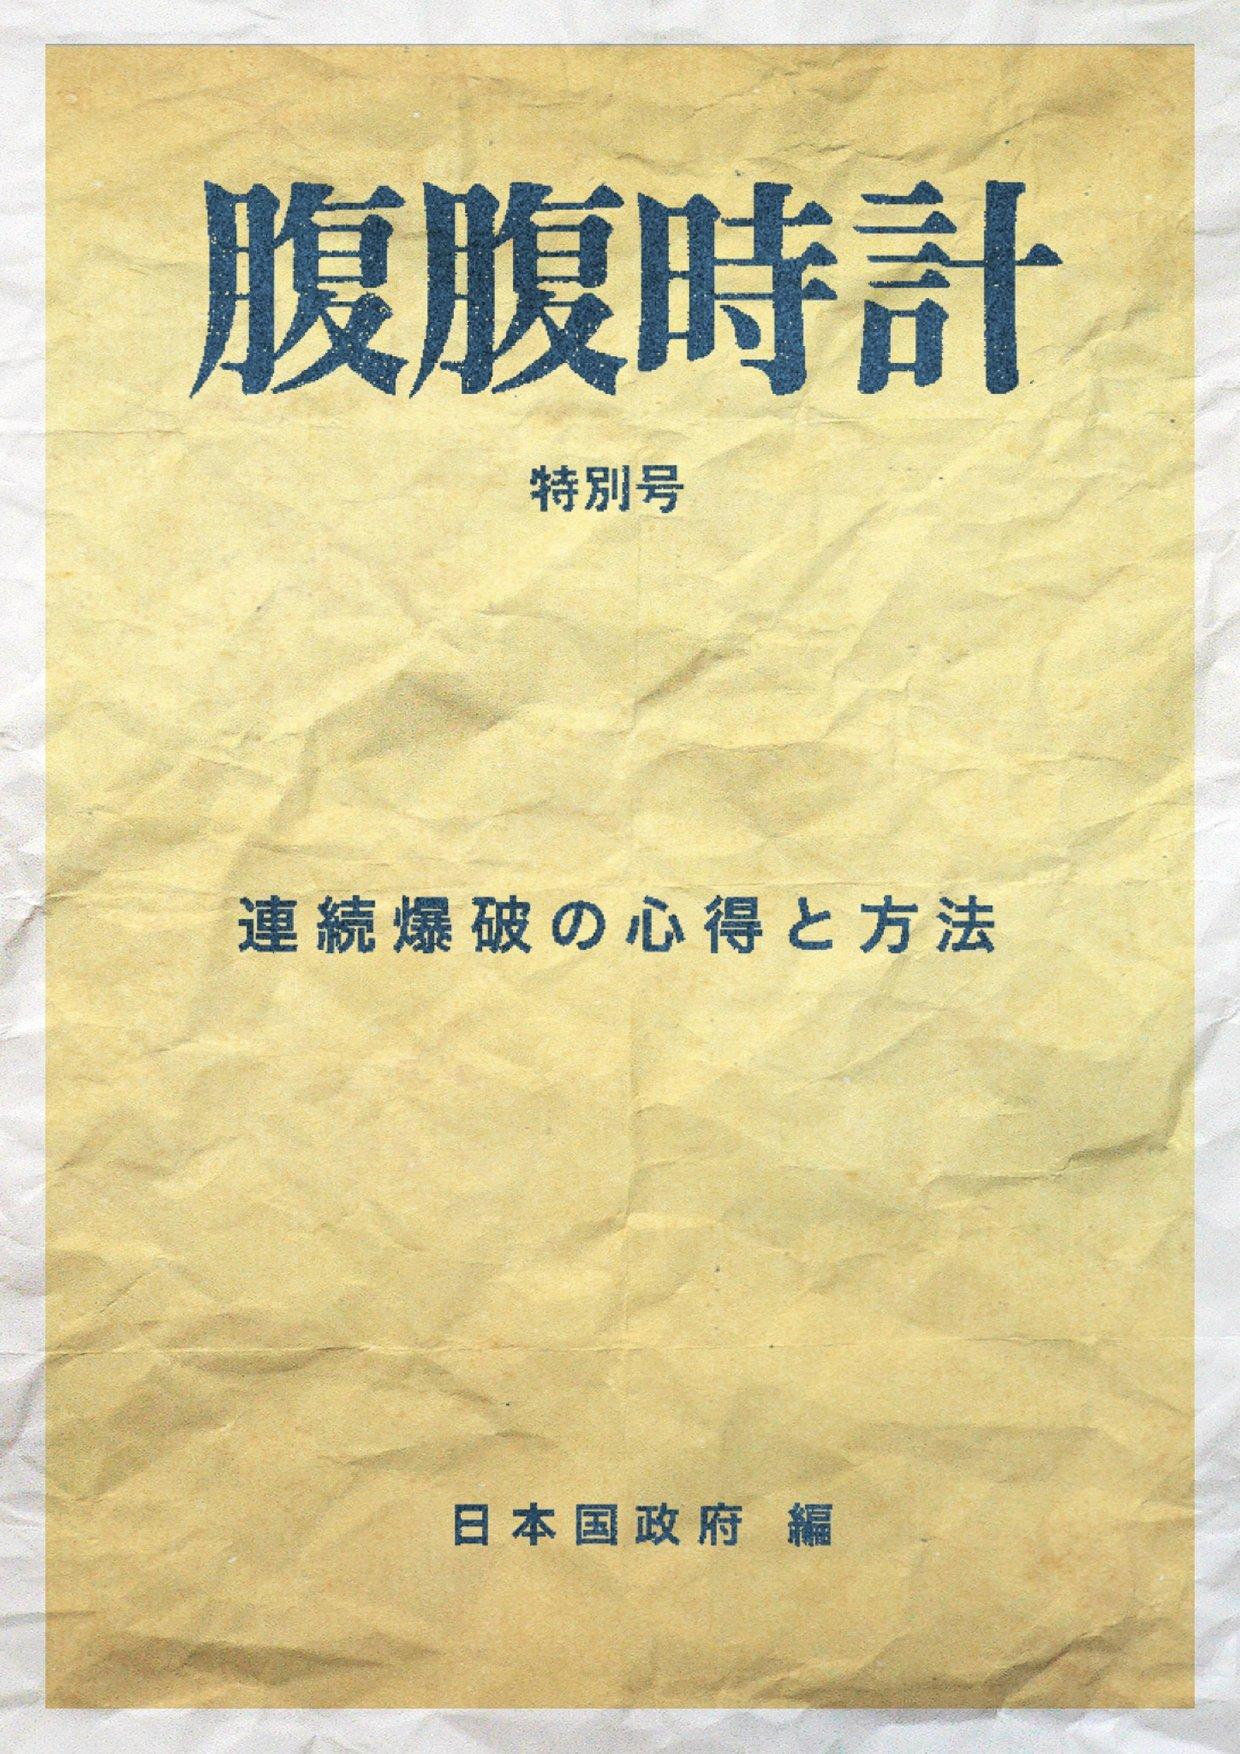 腹腹時計 連続爆破の心得と方法 日本国政府編